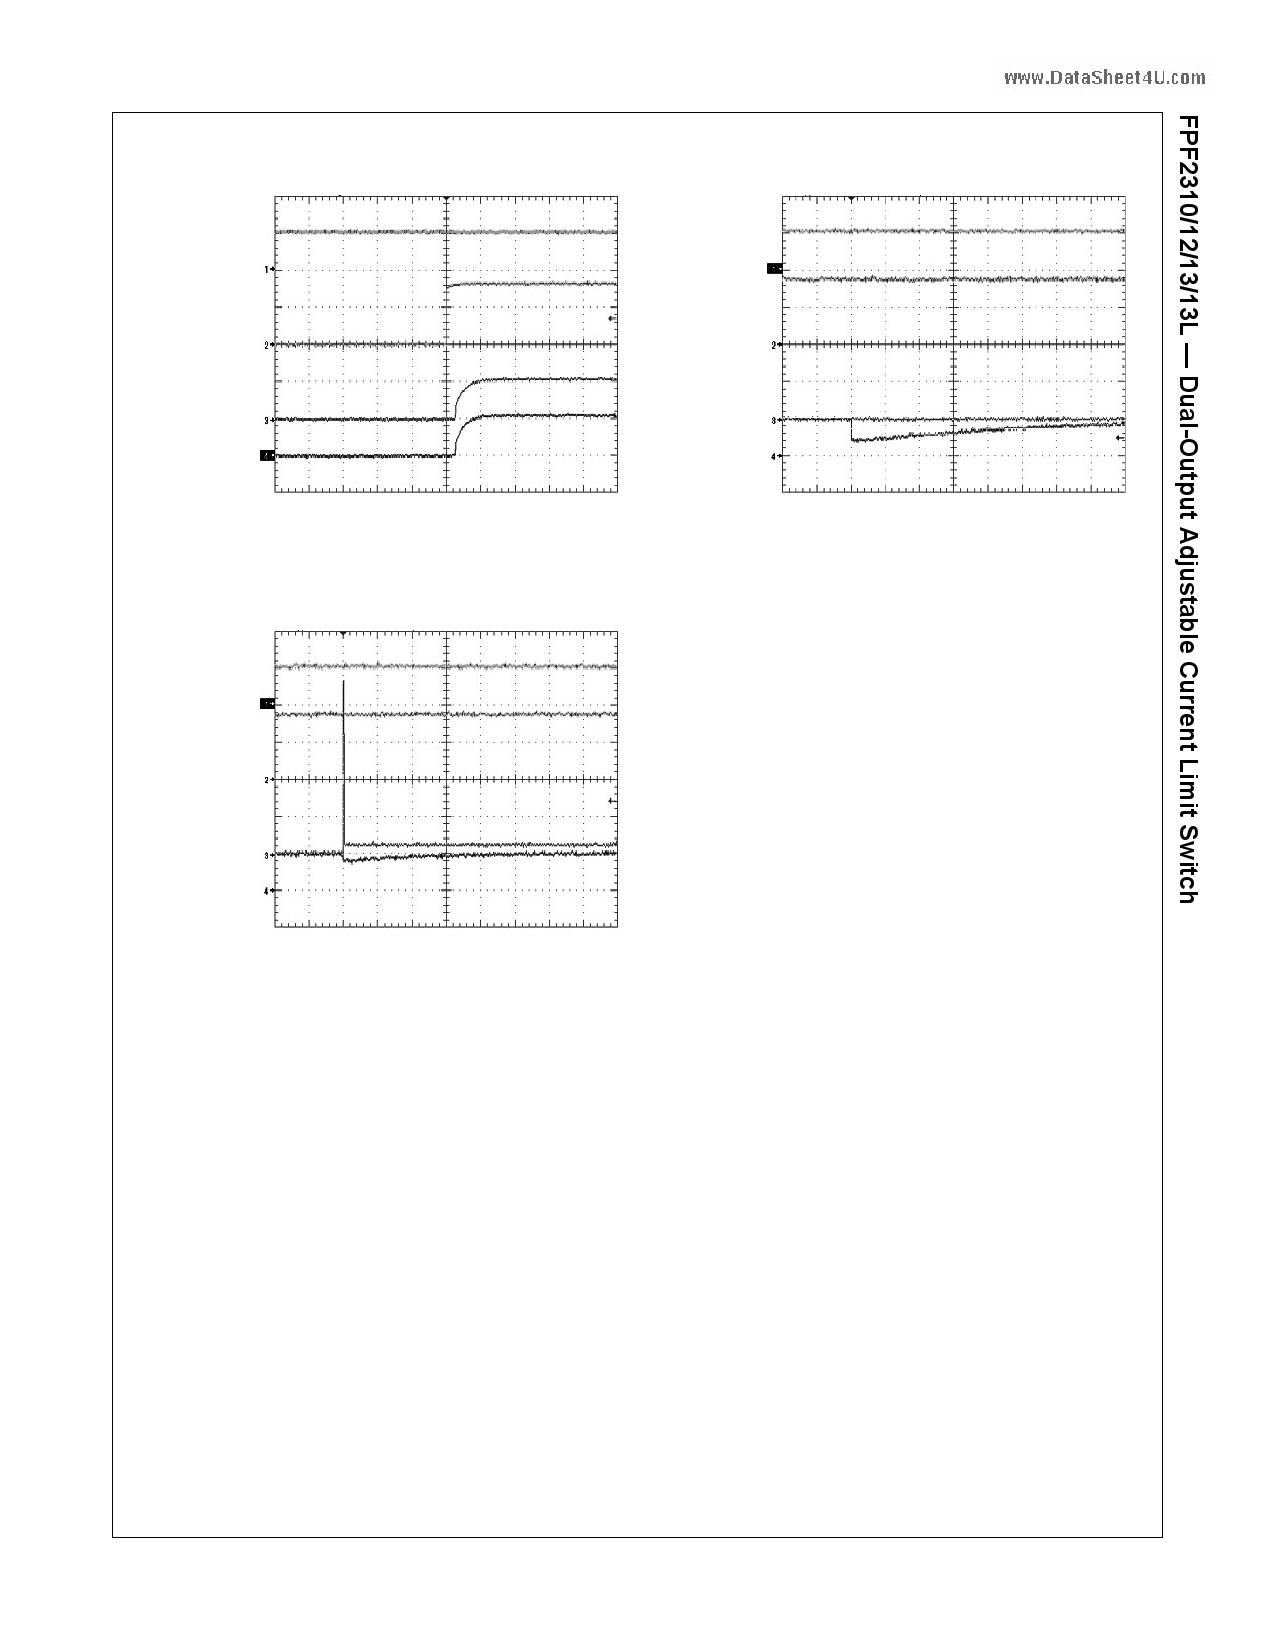 FPF2310 arduino